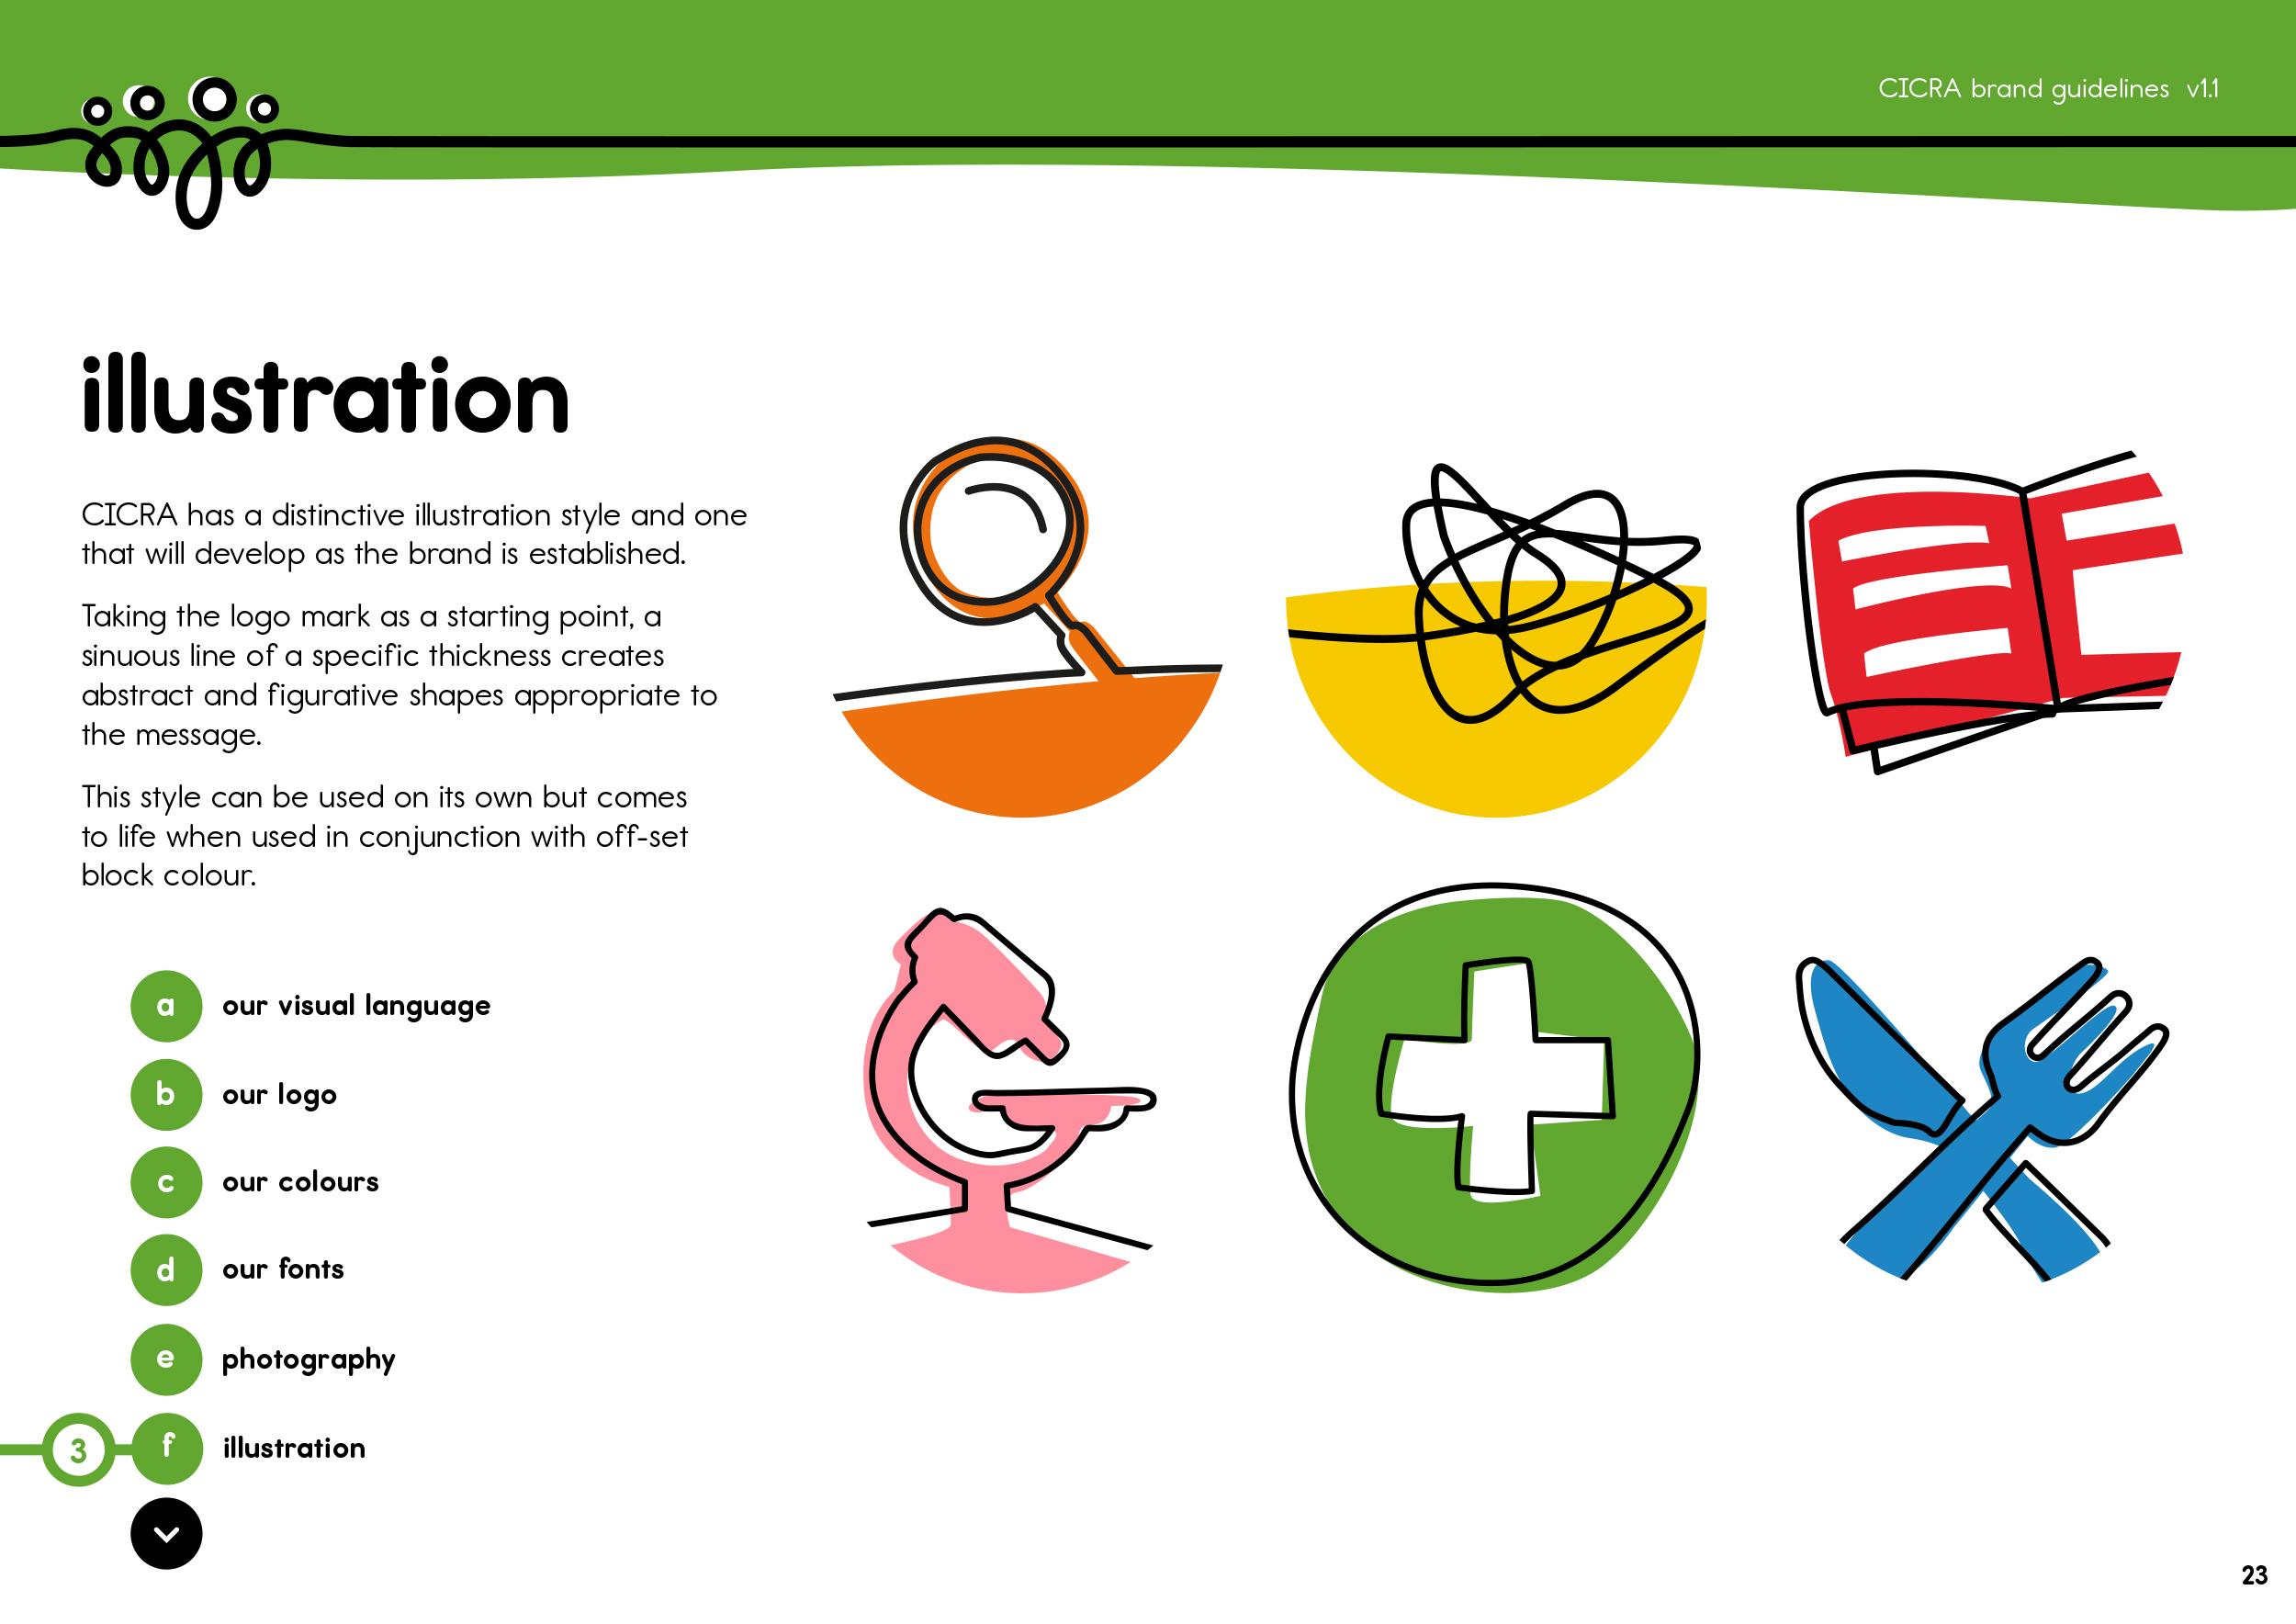 0188 CICRA Brand Guidelines_V1.1-23.jpg